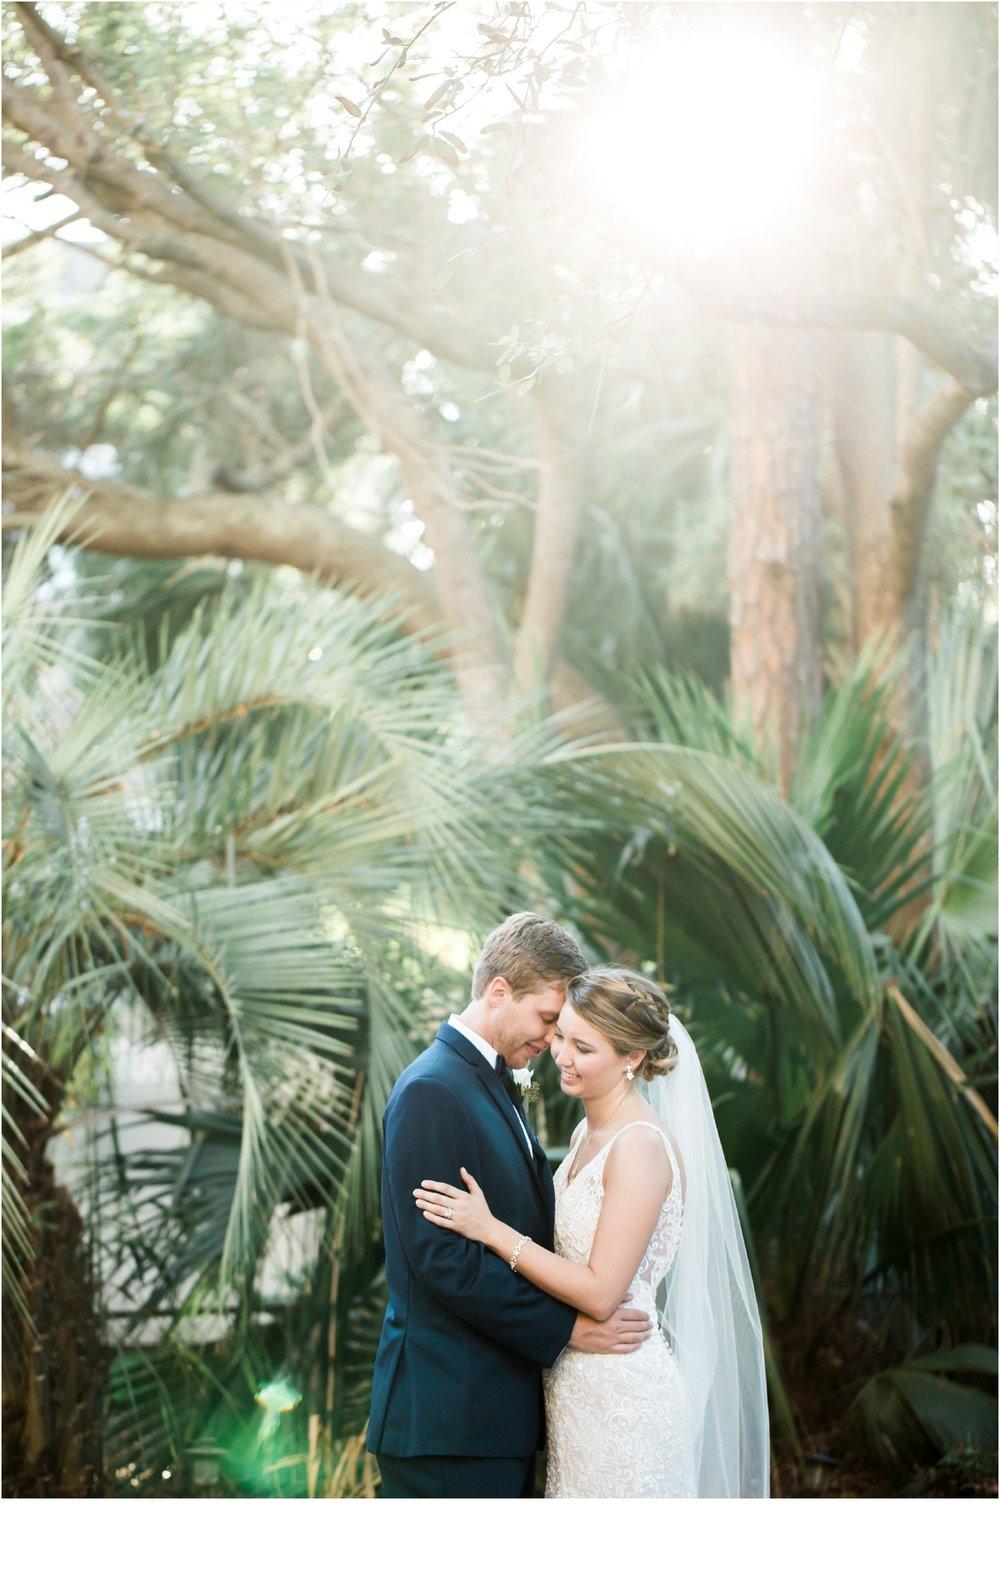 Rainey_Gregg_Photography_St._Simons_Island_Georgia_California_Wedding_Portrait_Photography_0671.jpg